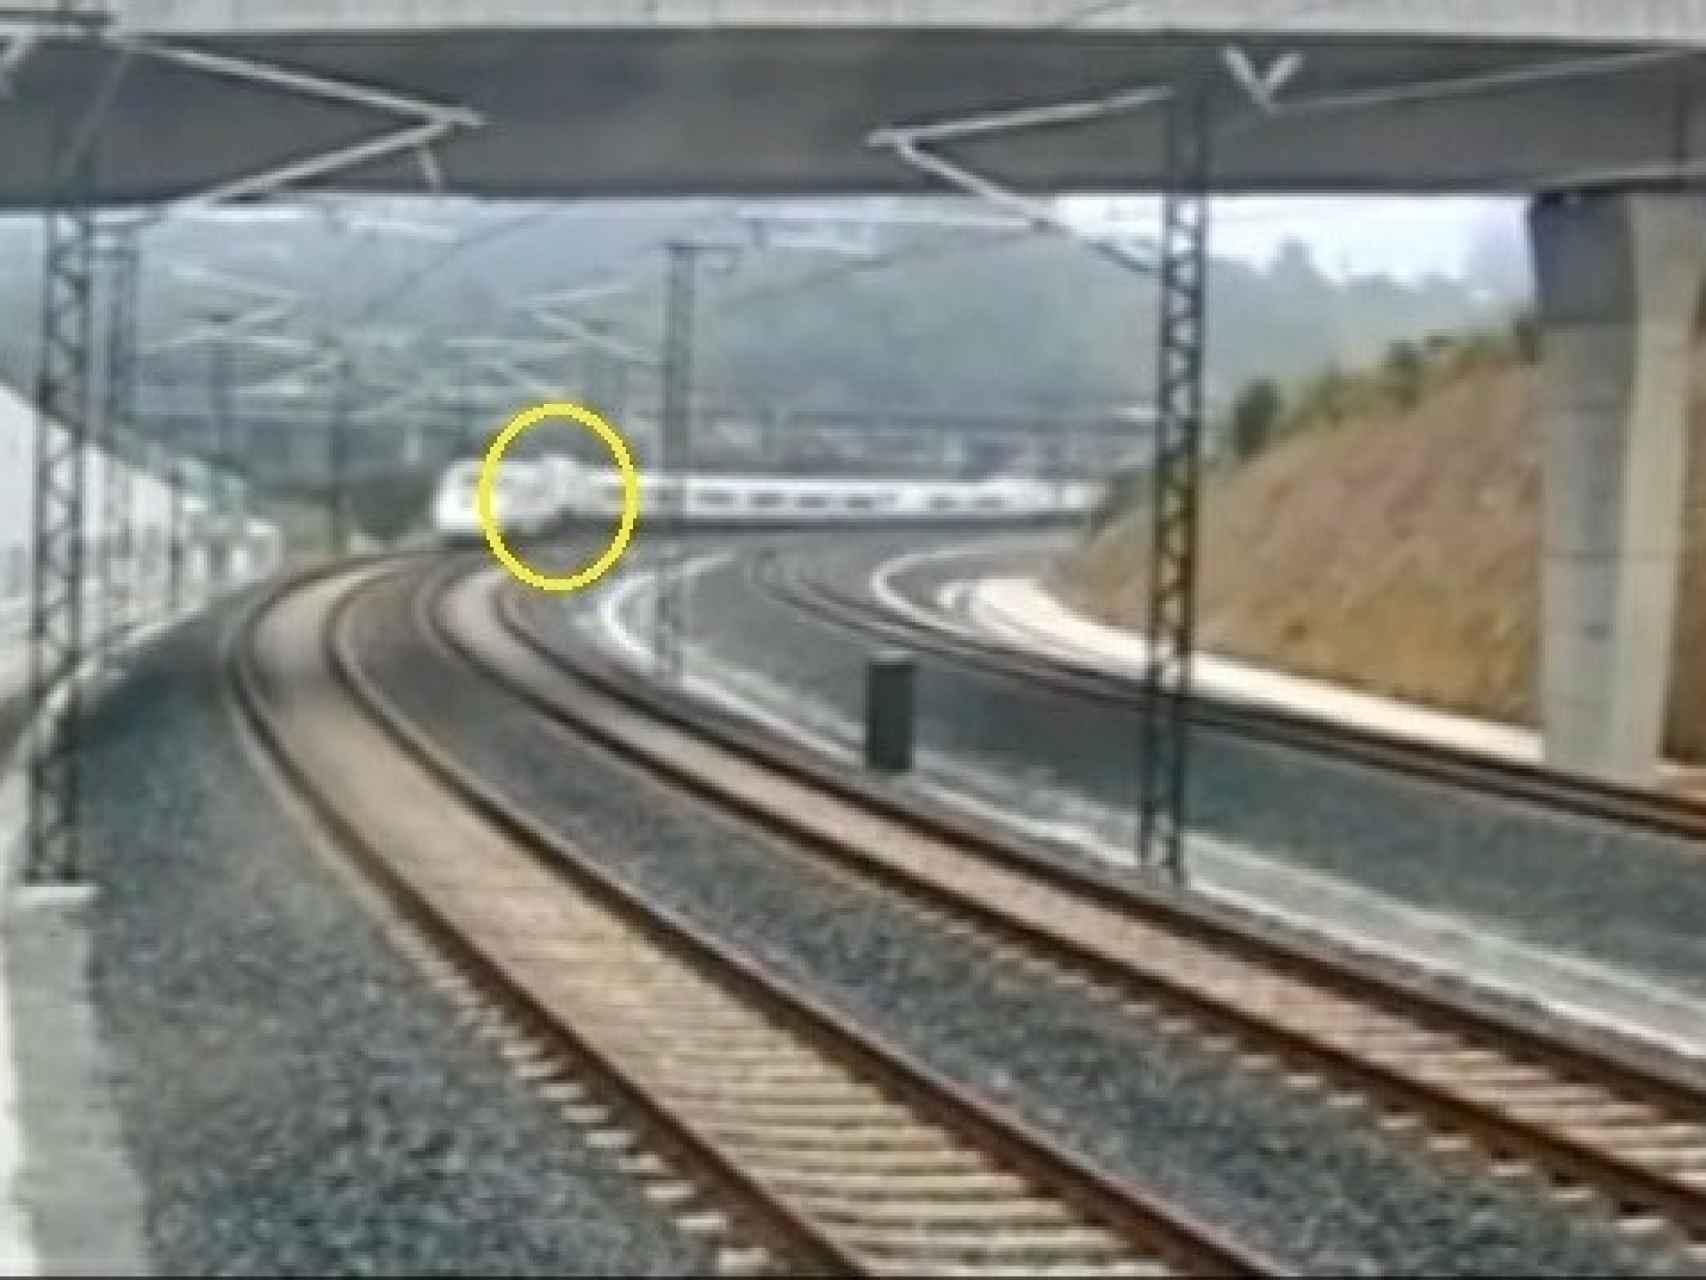 Captura 12 del vídeo del accidente del tren Alvia 730